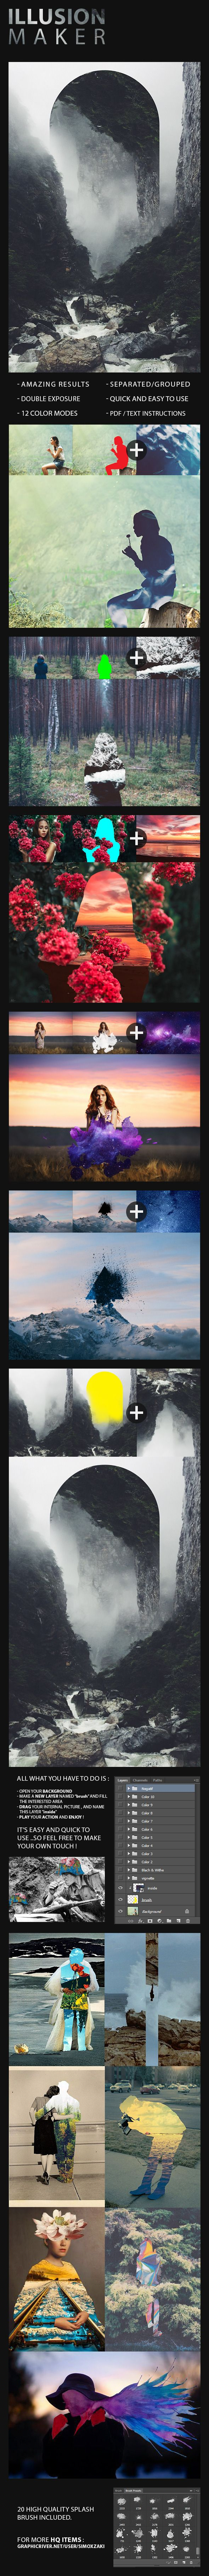 Illusion Photoshop Action #photoeffect Download: http://graphicriver.net/item/illusion-action/12146197?ref=ksioks